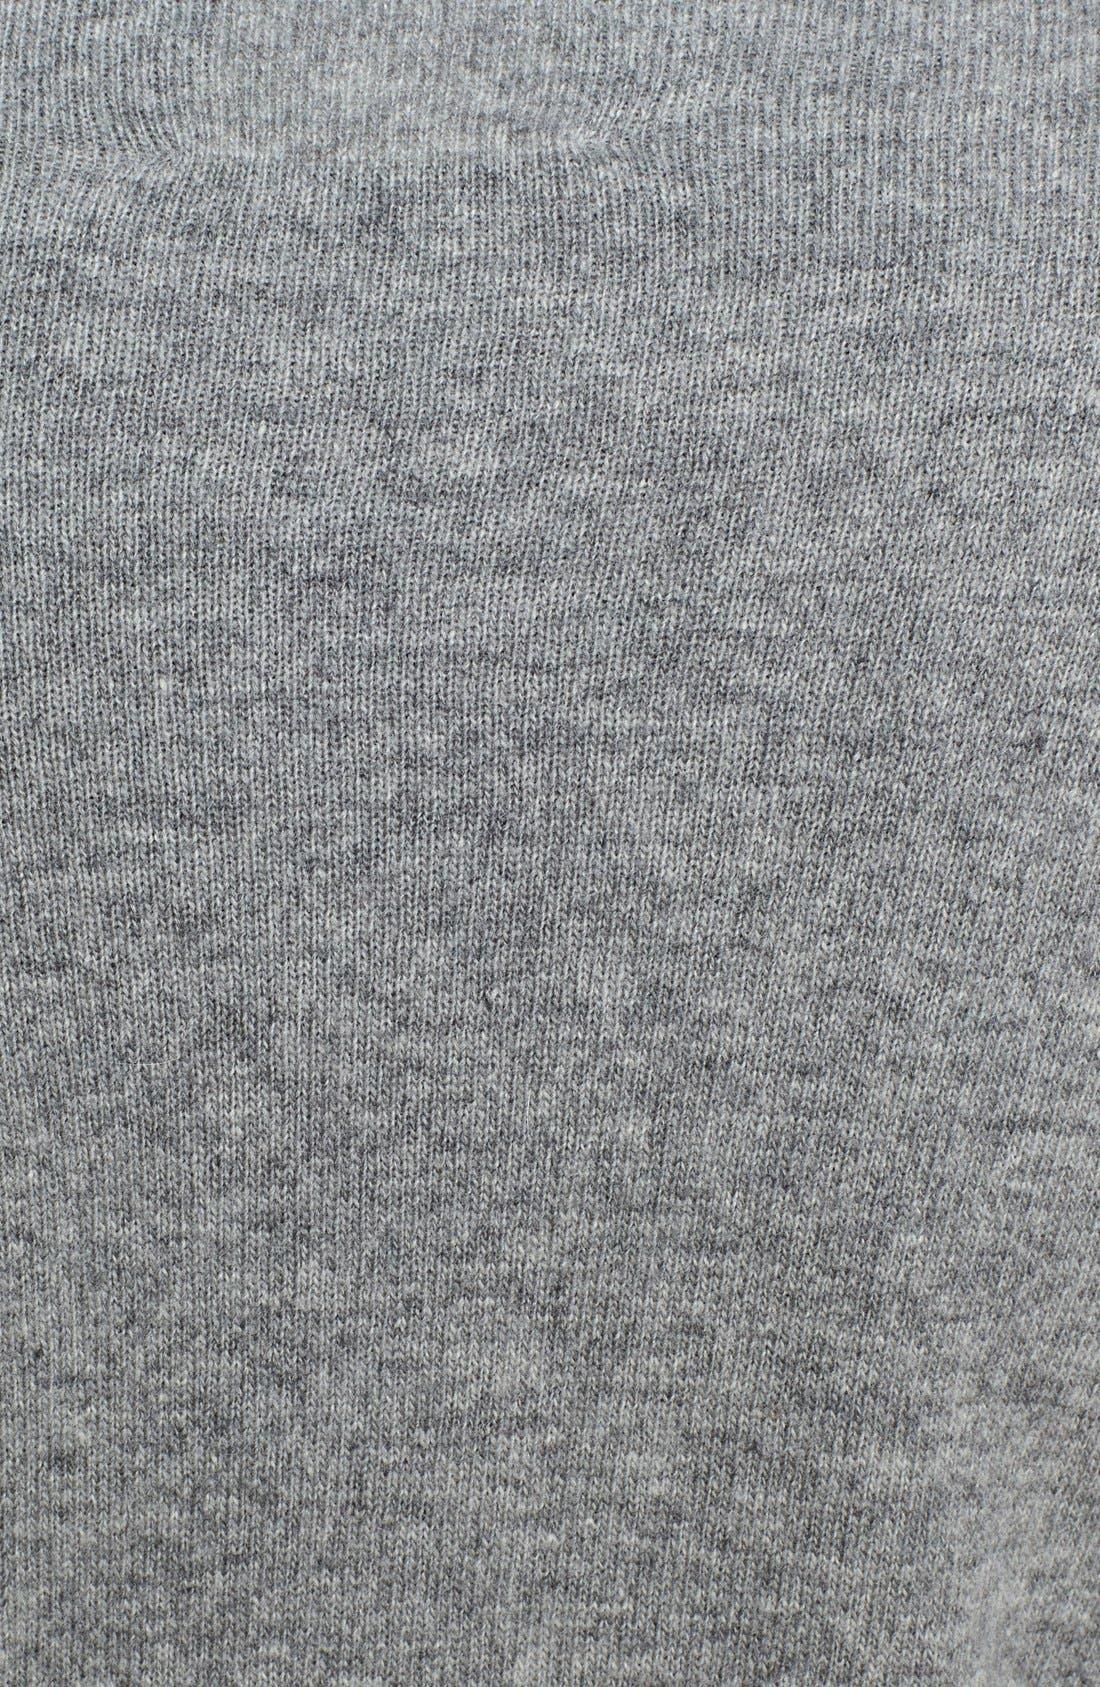 Eyelash Felted Wool Sweater,                             Alternate thumbnail 4, color,                             066